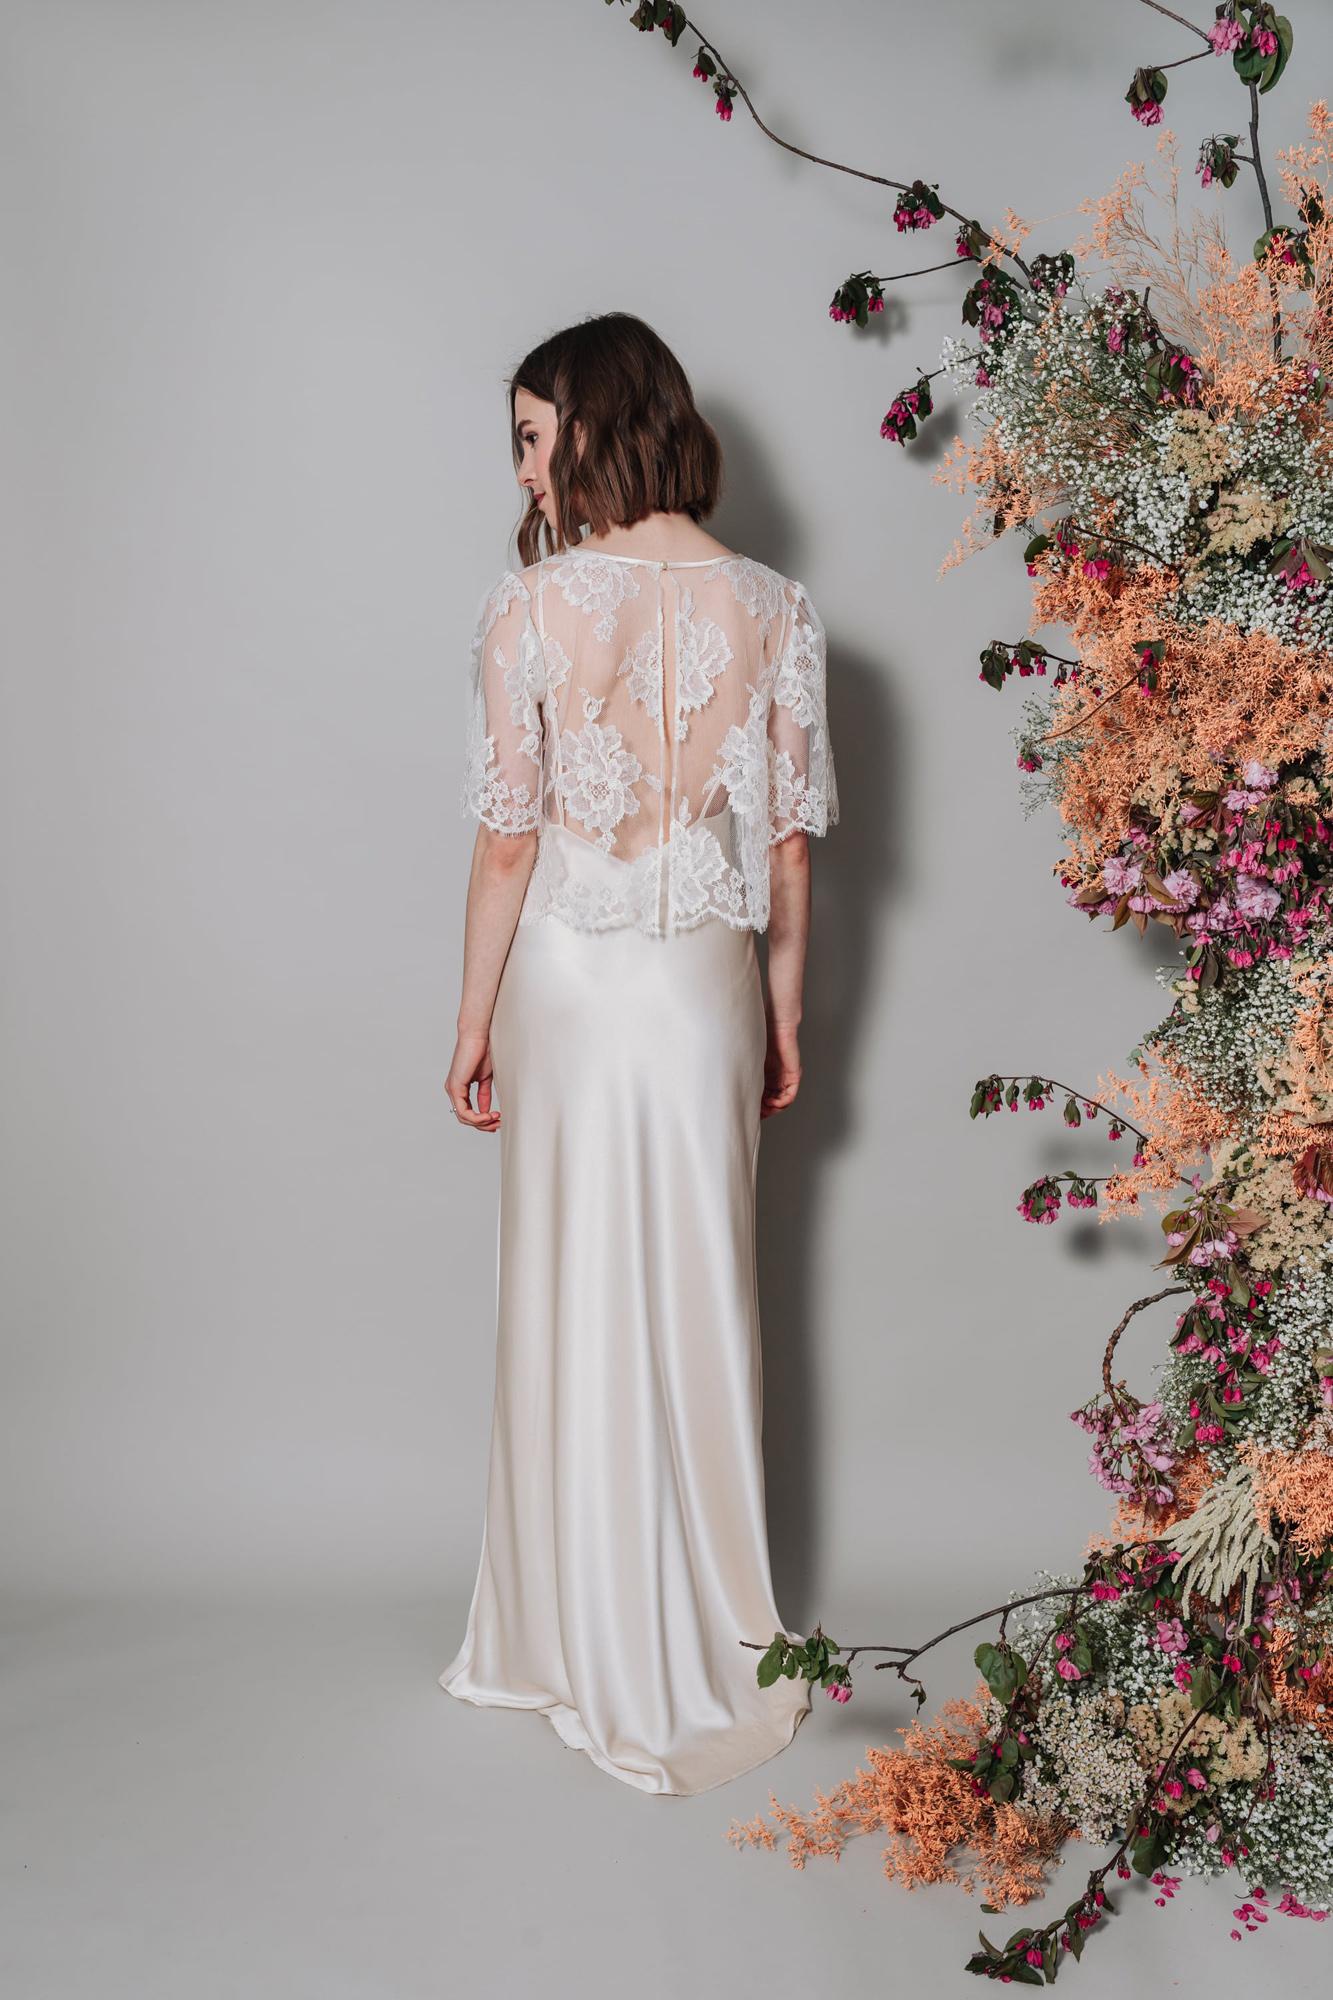 Kate-Beaumont-Sheffield-Rosa-Floral-Lace-Jacket-Camellia-Bias-Cut-Silk-Wedding-Gown-7.jpg